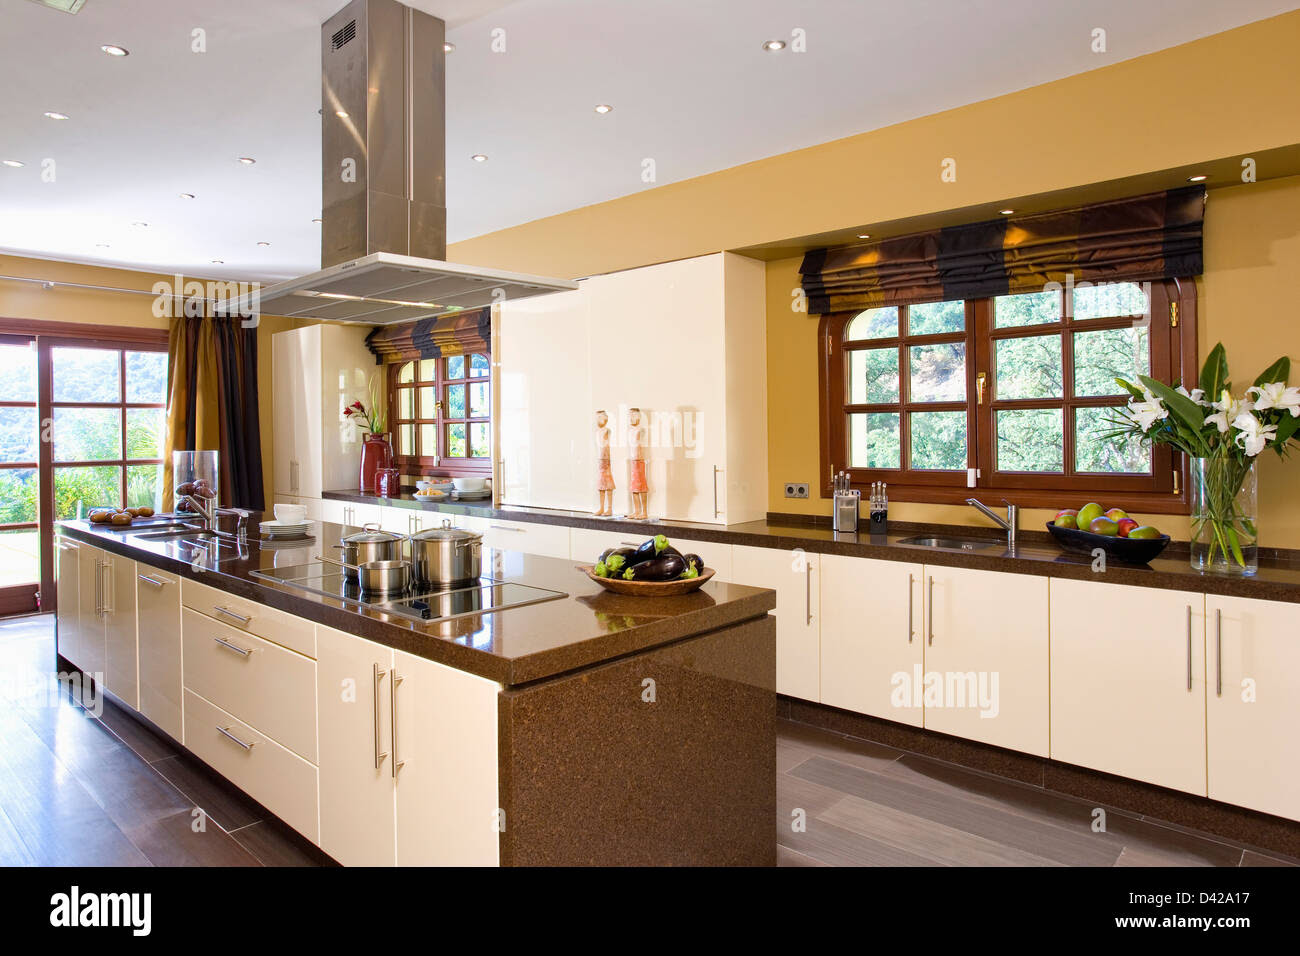 extractor fan over island unit in modern kitchen in spanish villa